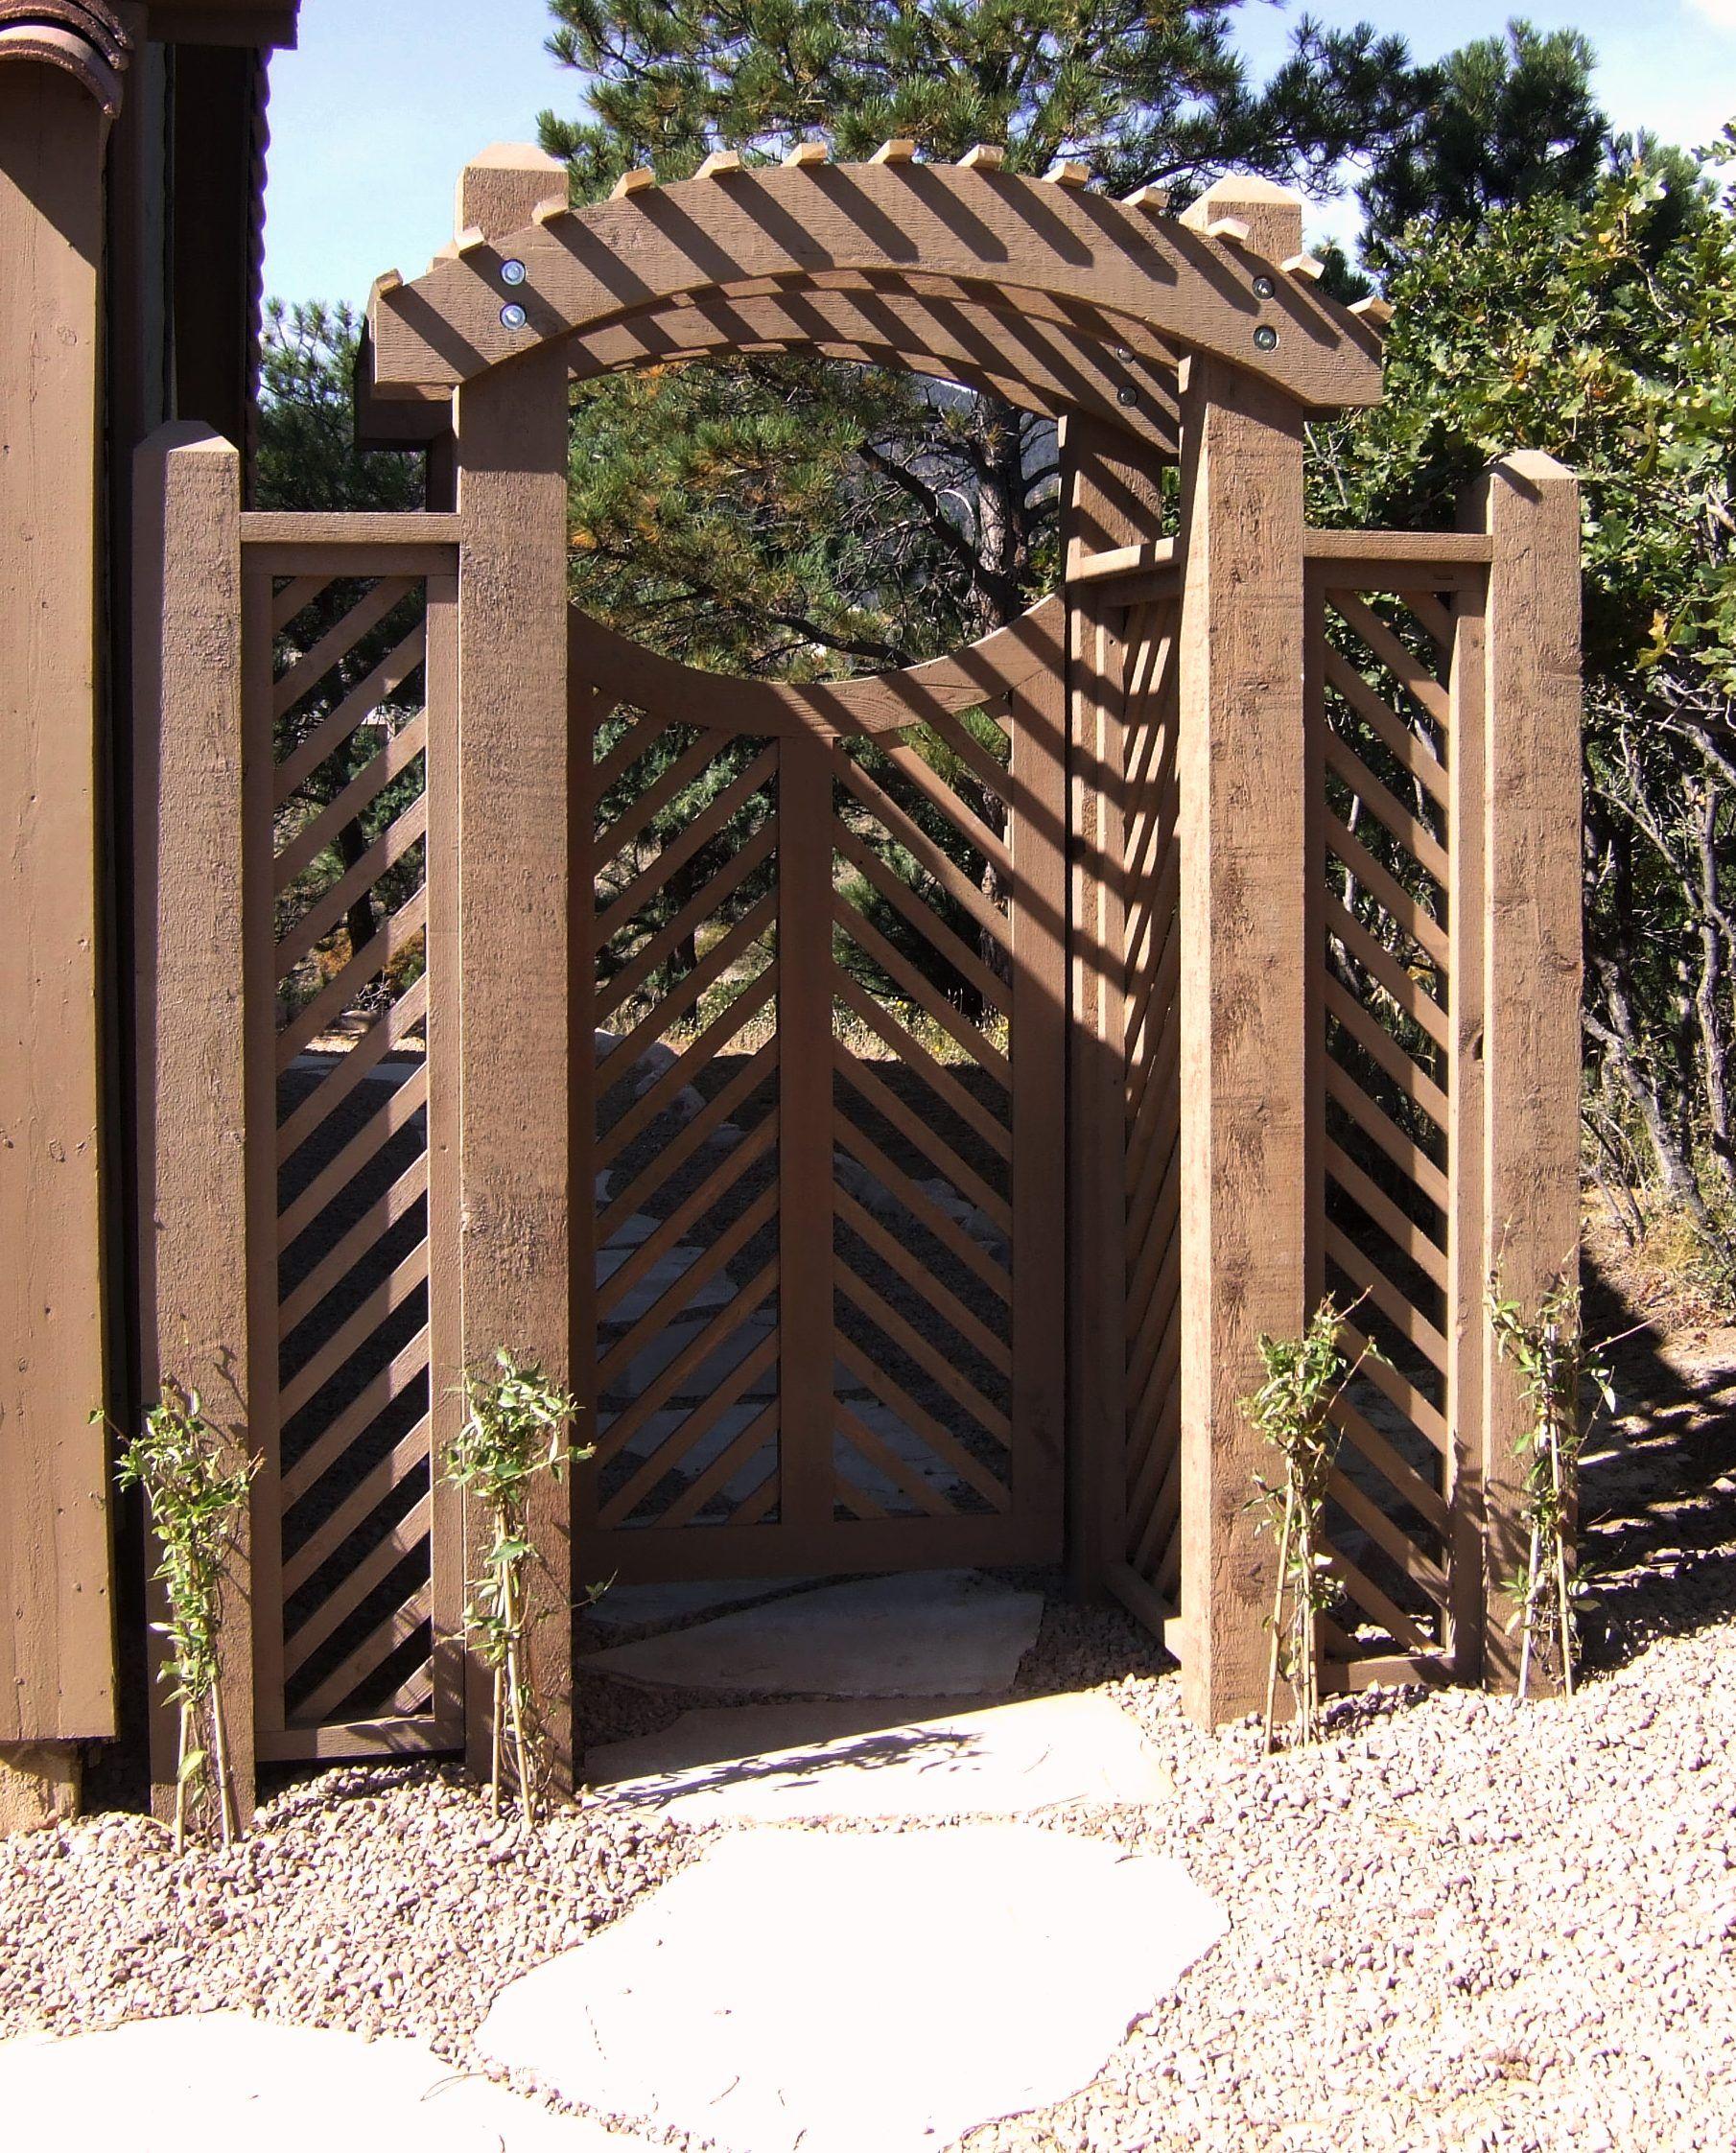 Fence Gate Arbor: Pergola Gate Designs - Google Search